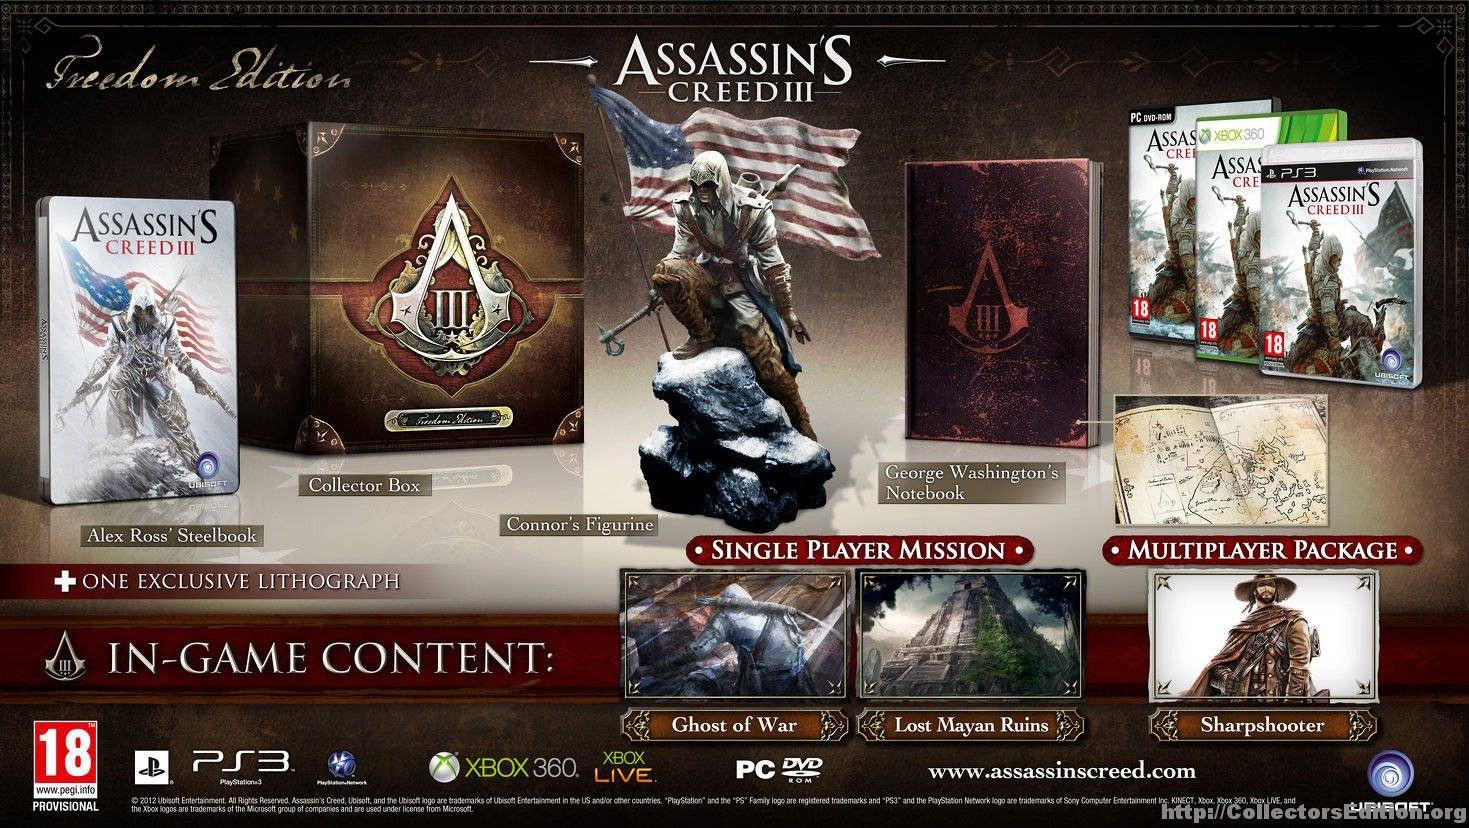 Collectorsedition Org Assassins Creed Gaming Assassins Creed